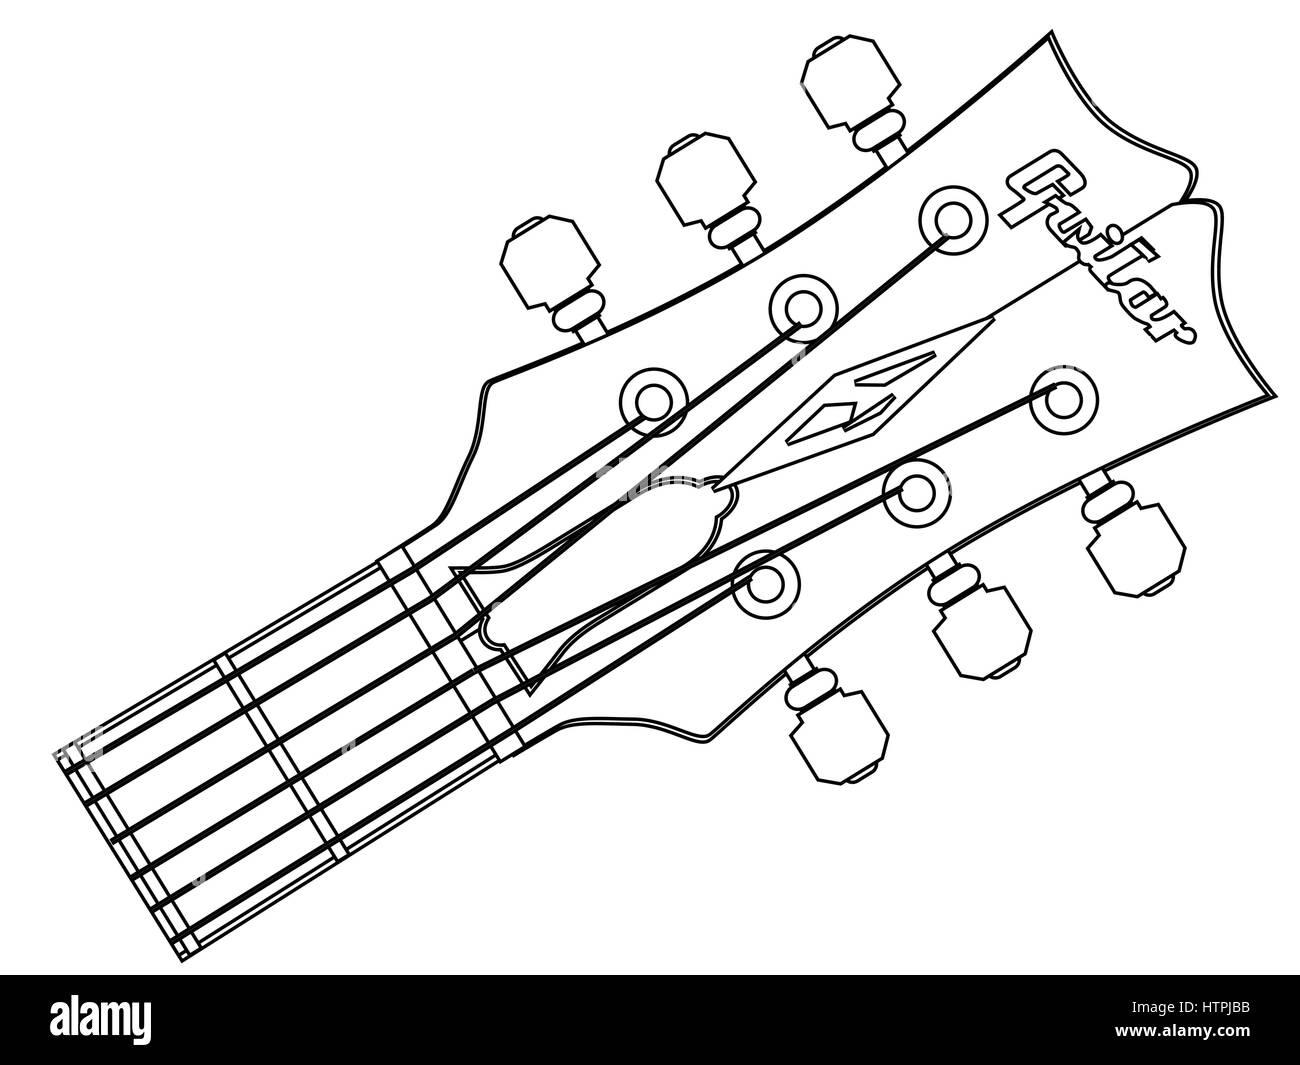 Gibson Les Paul Traditional Guitar Stock Photos & Gibson Les Paul ...